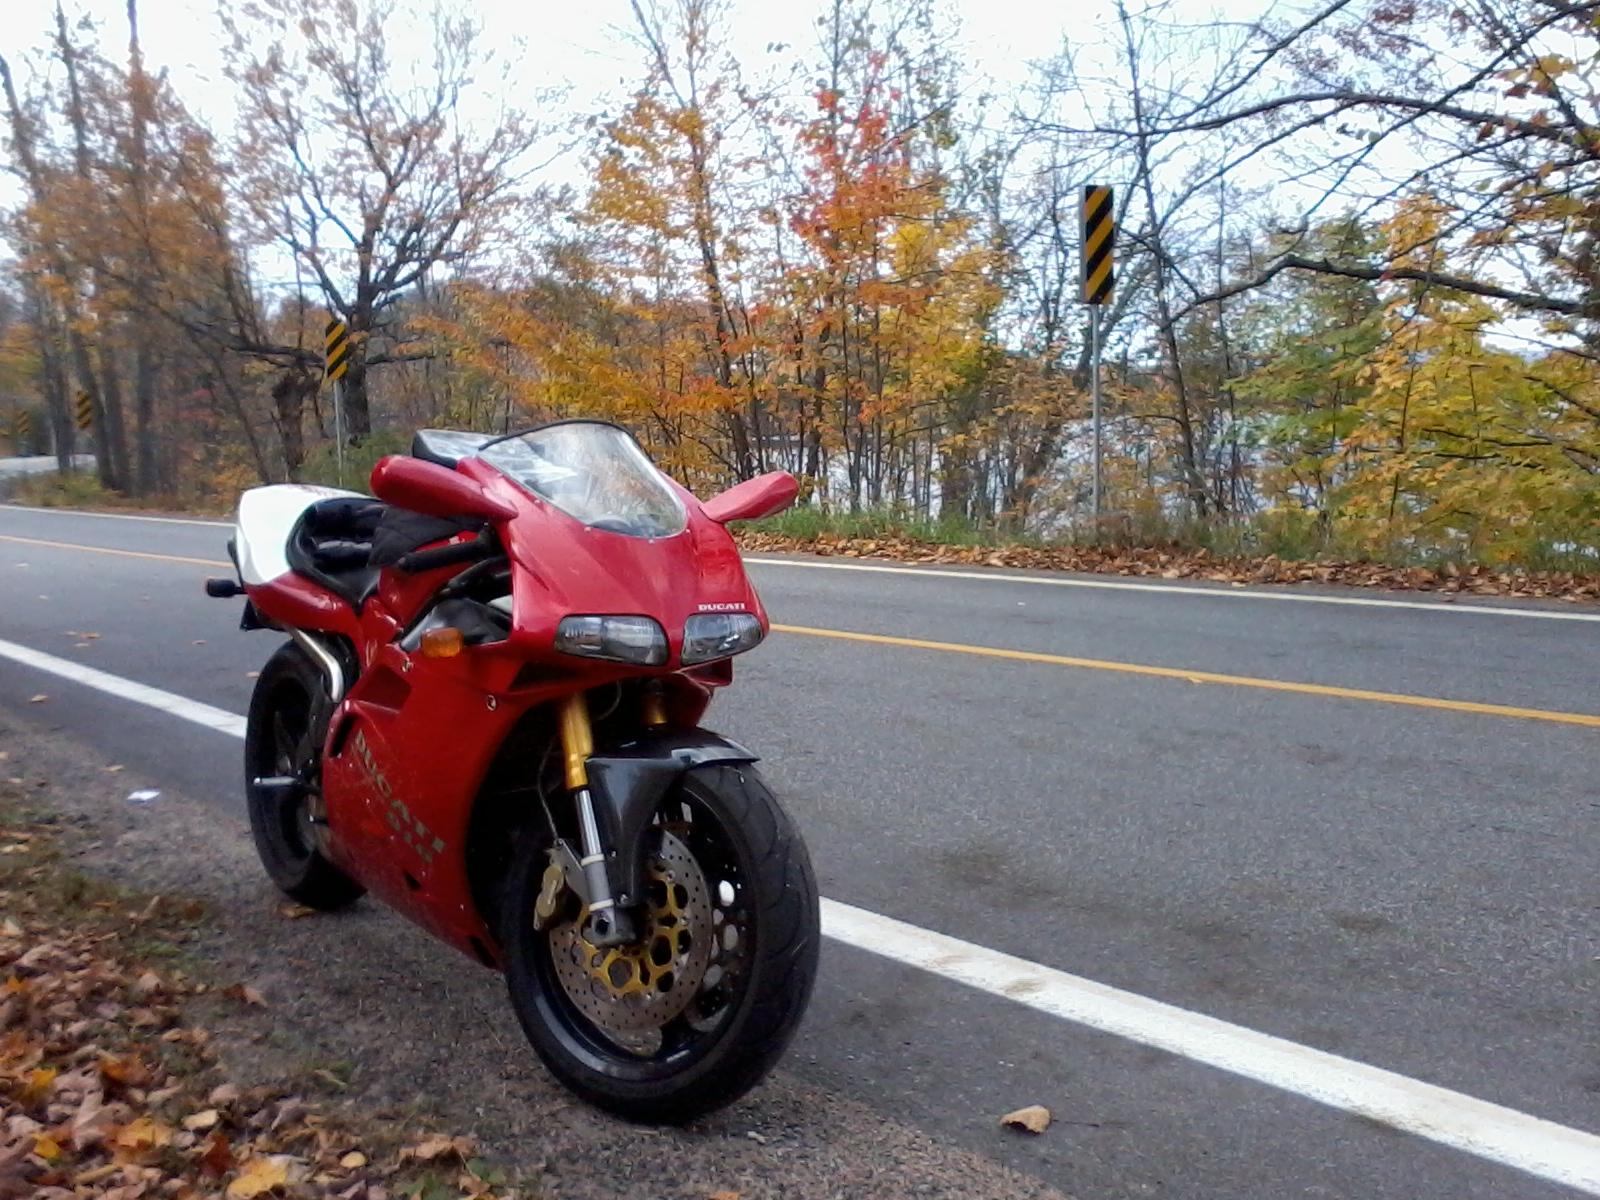 OddBike: Riding the Legend – The Ducati 916